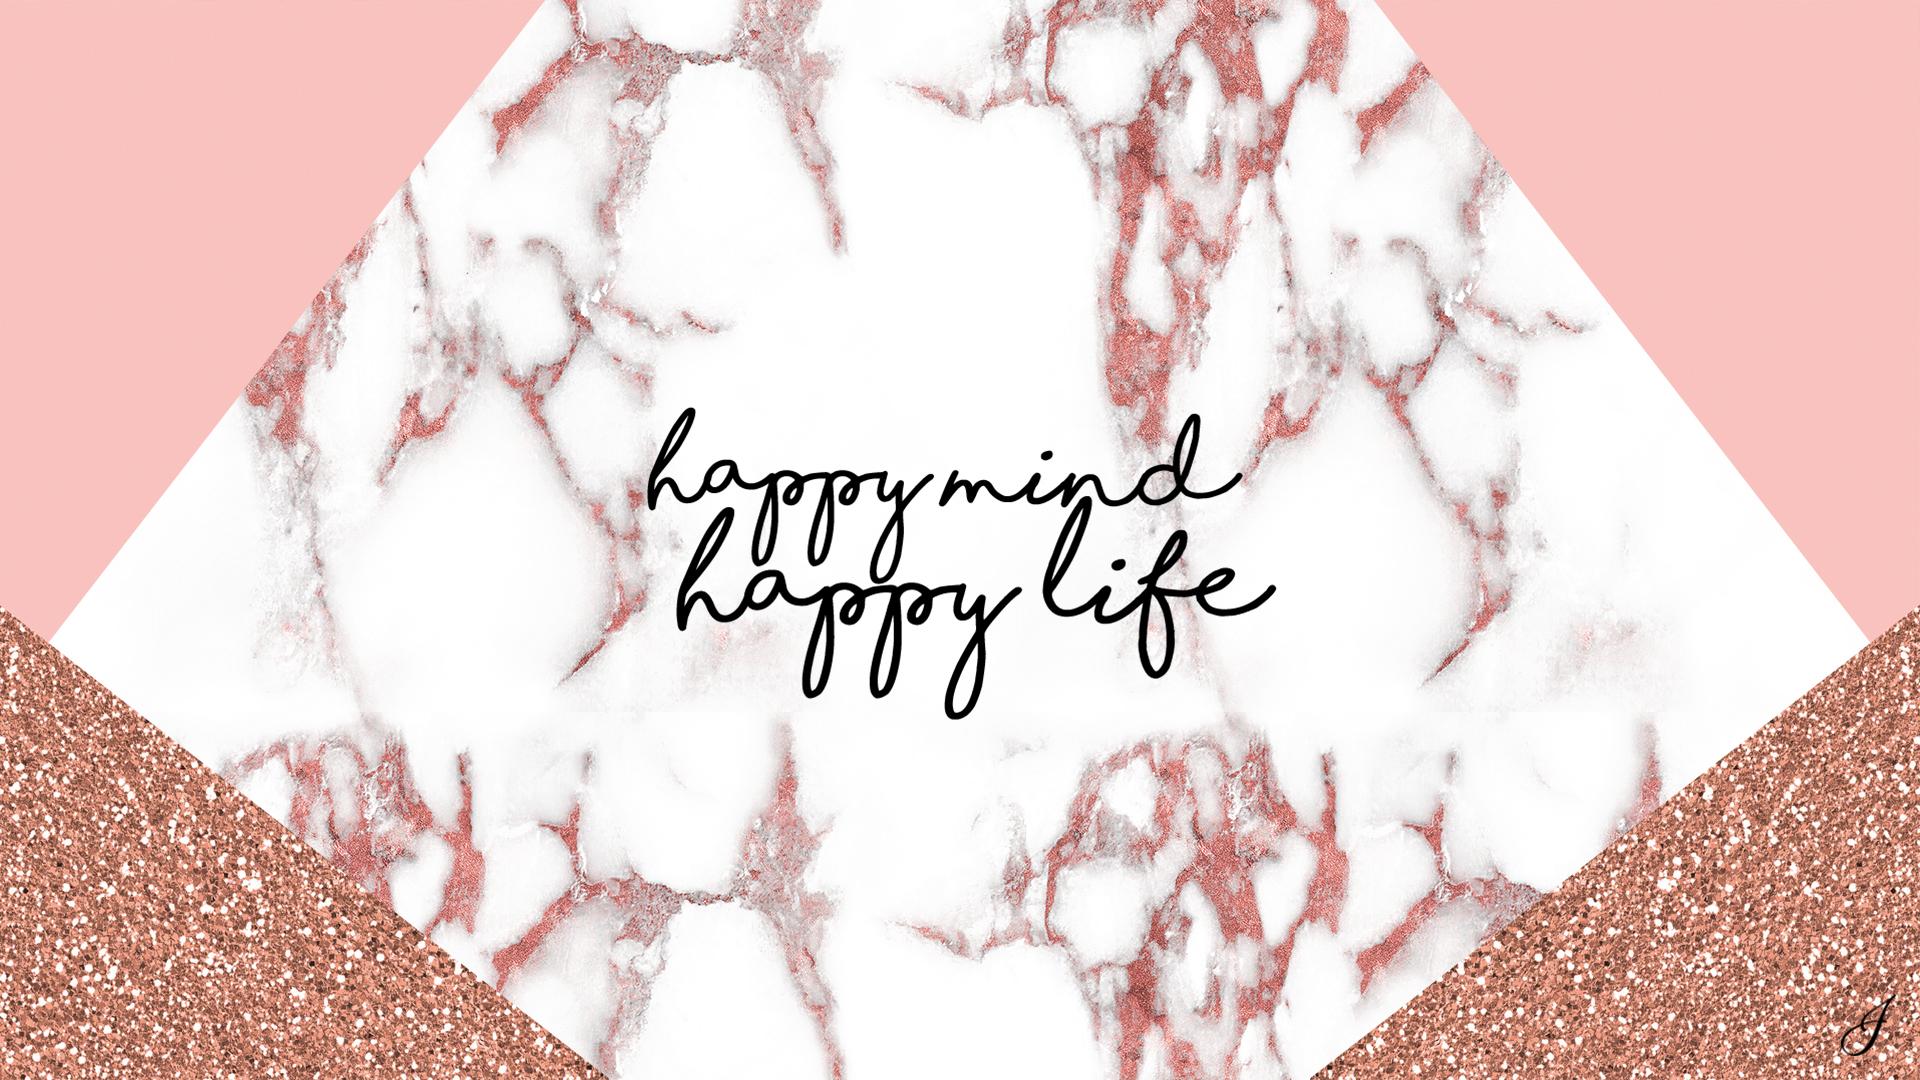 Wallpaper Koral Hd Wallpaper Rose Gold Marble